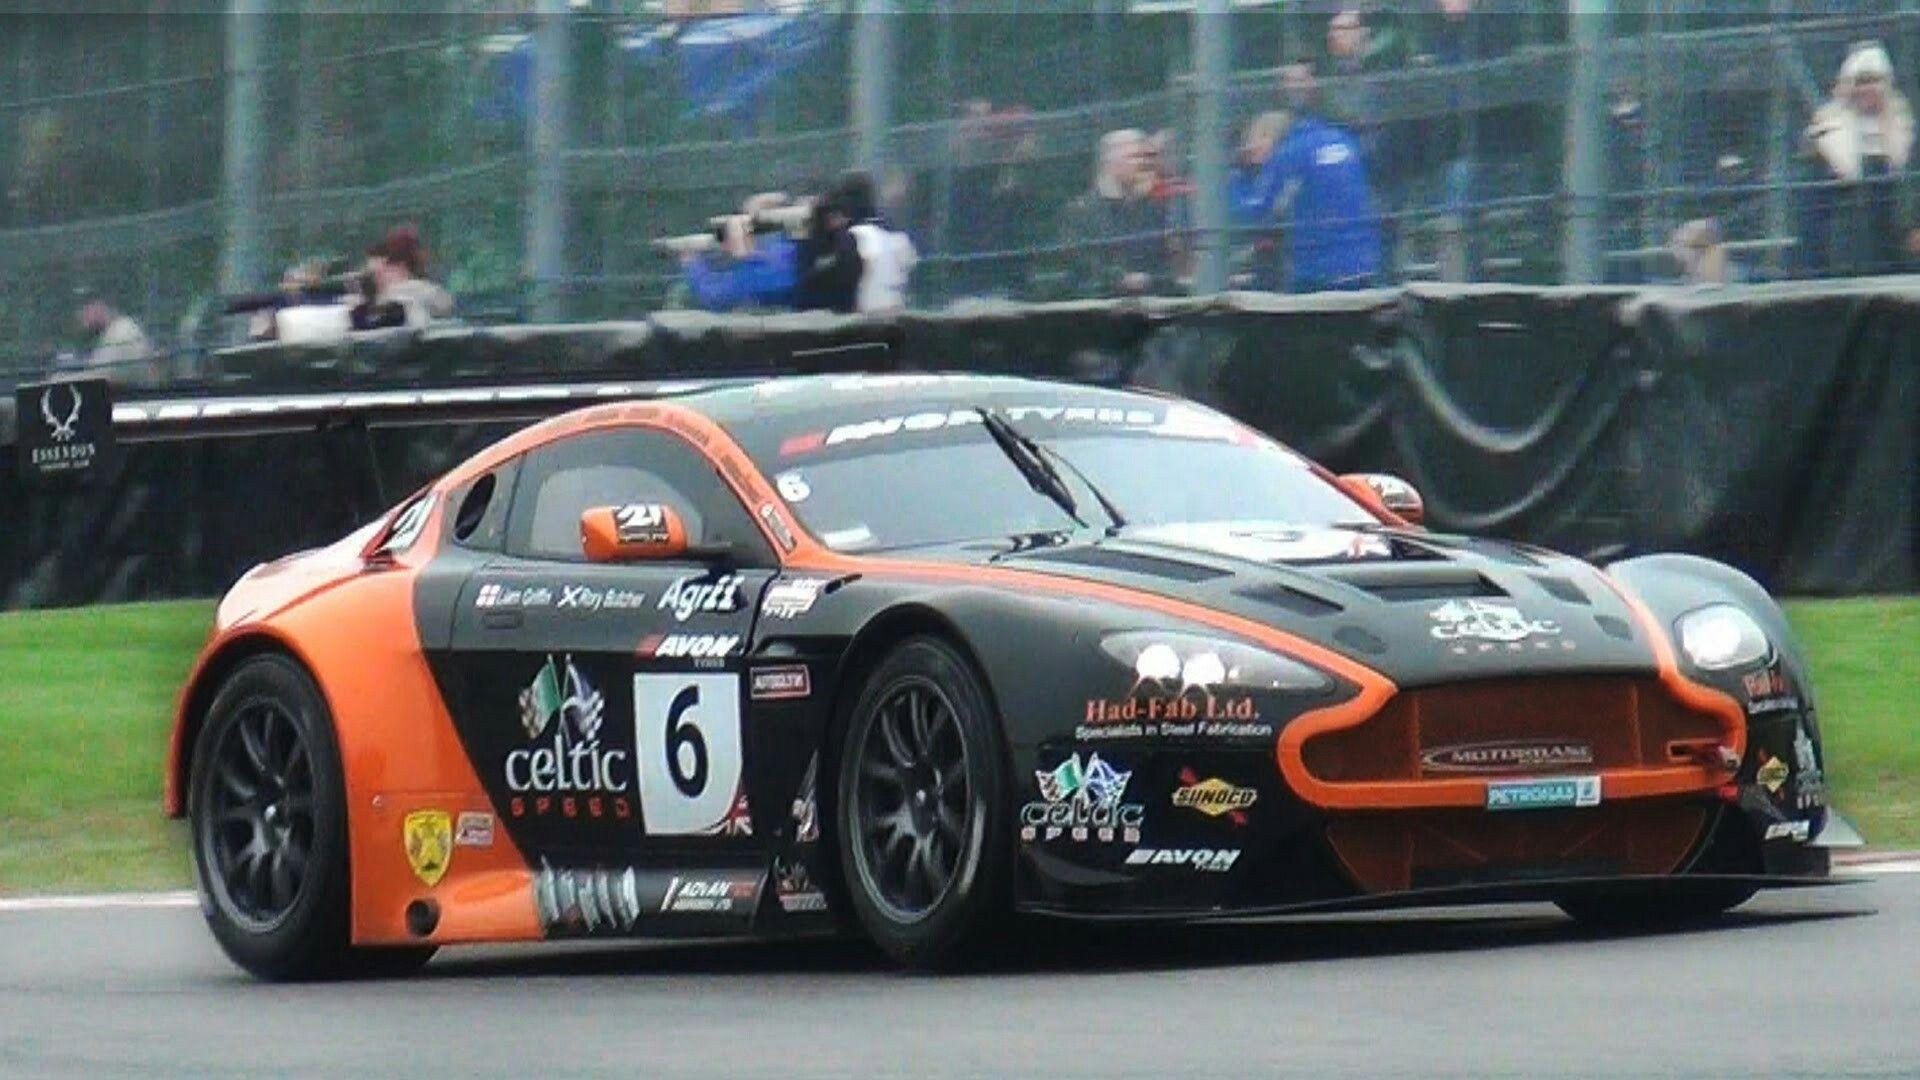 Aston Martin V12 Vantage Gt3 Lovely Sound On Track Youtube